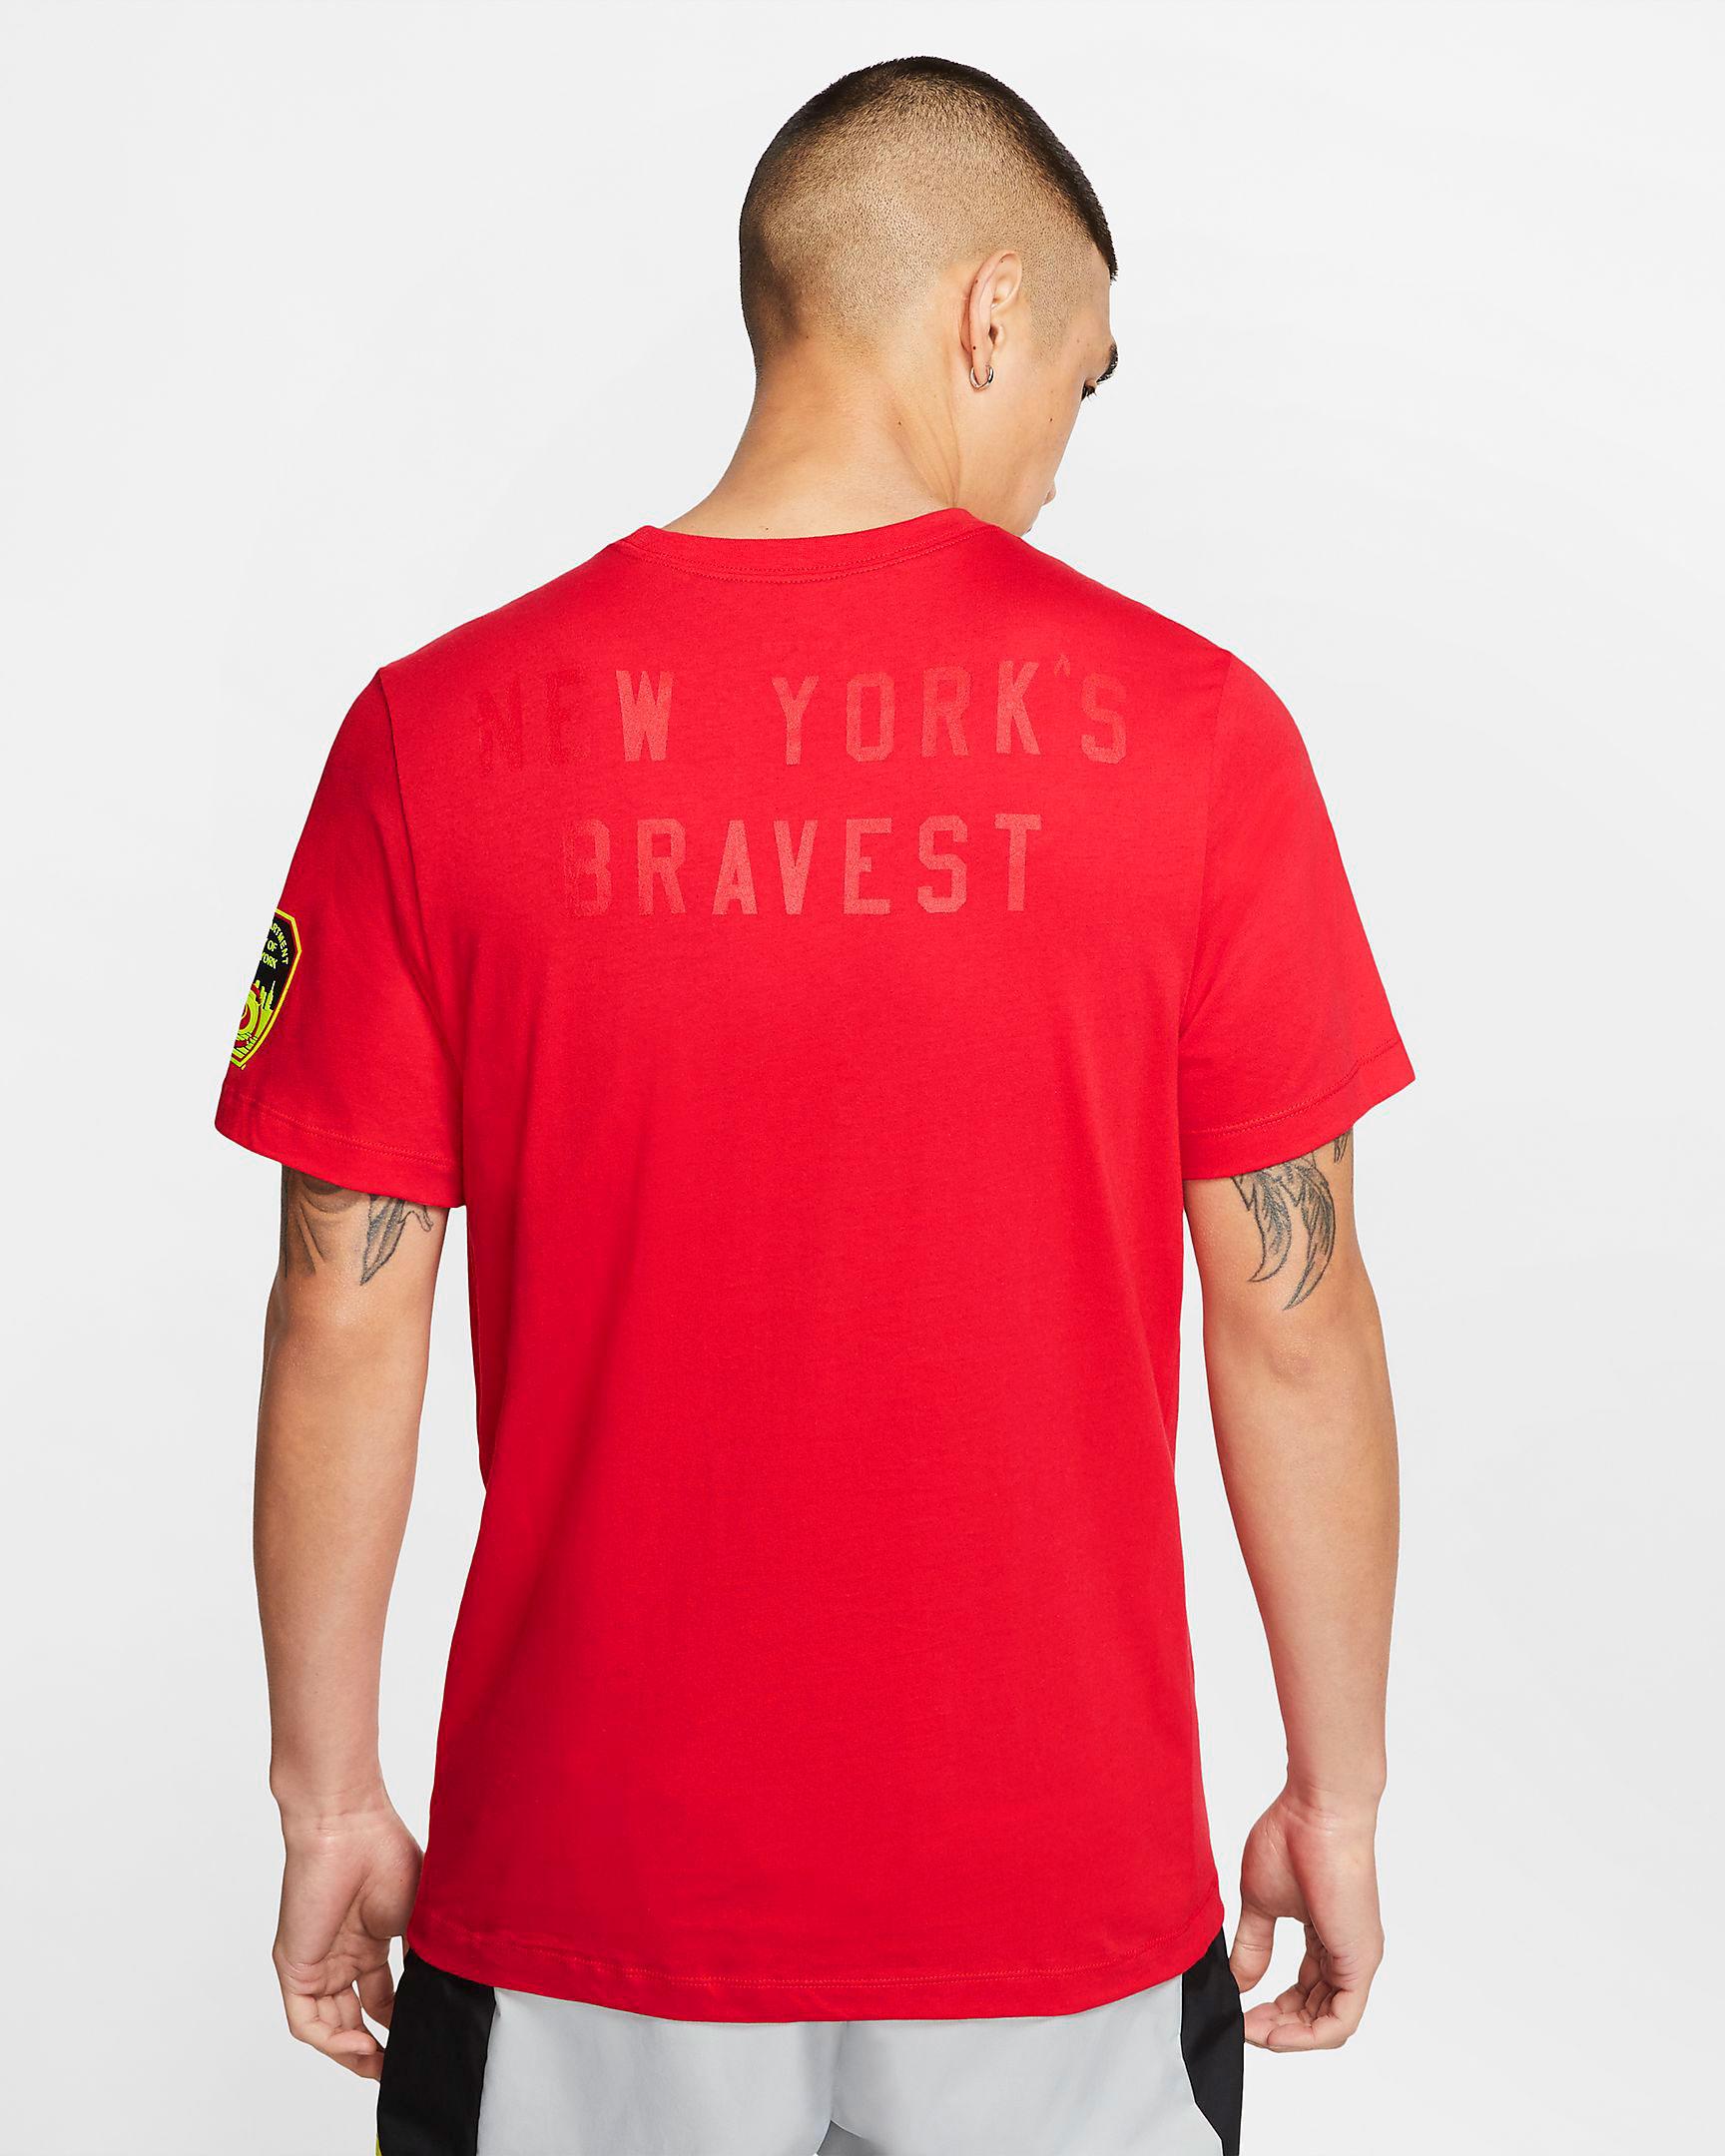 nike-fdny-shirt-2